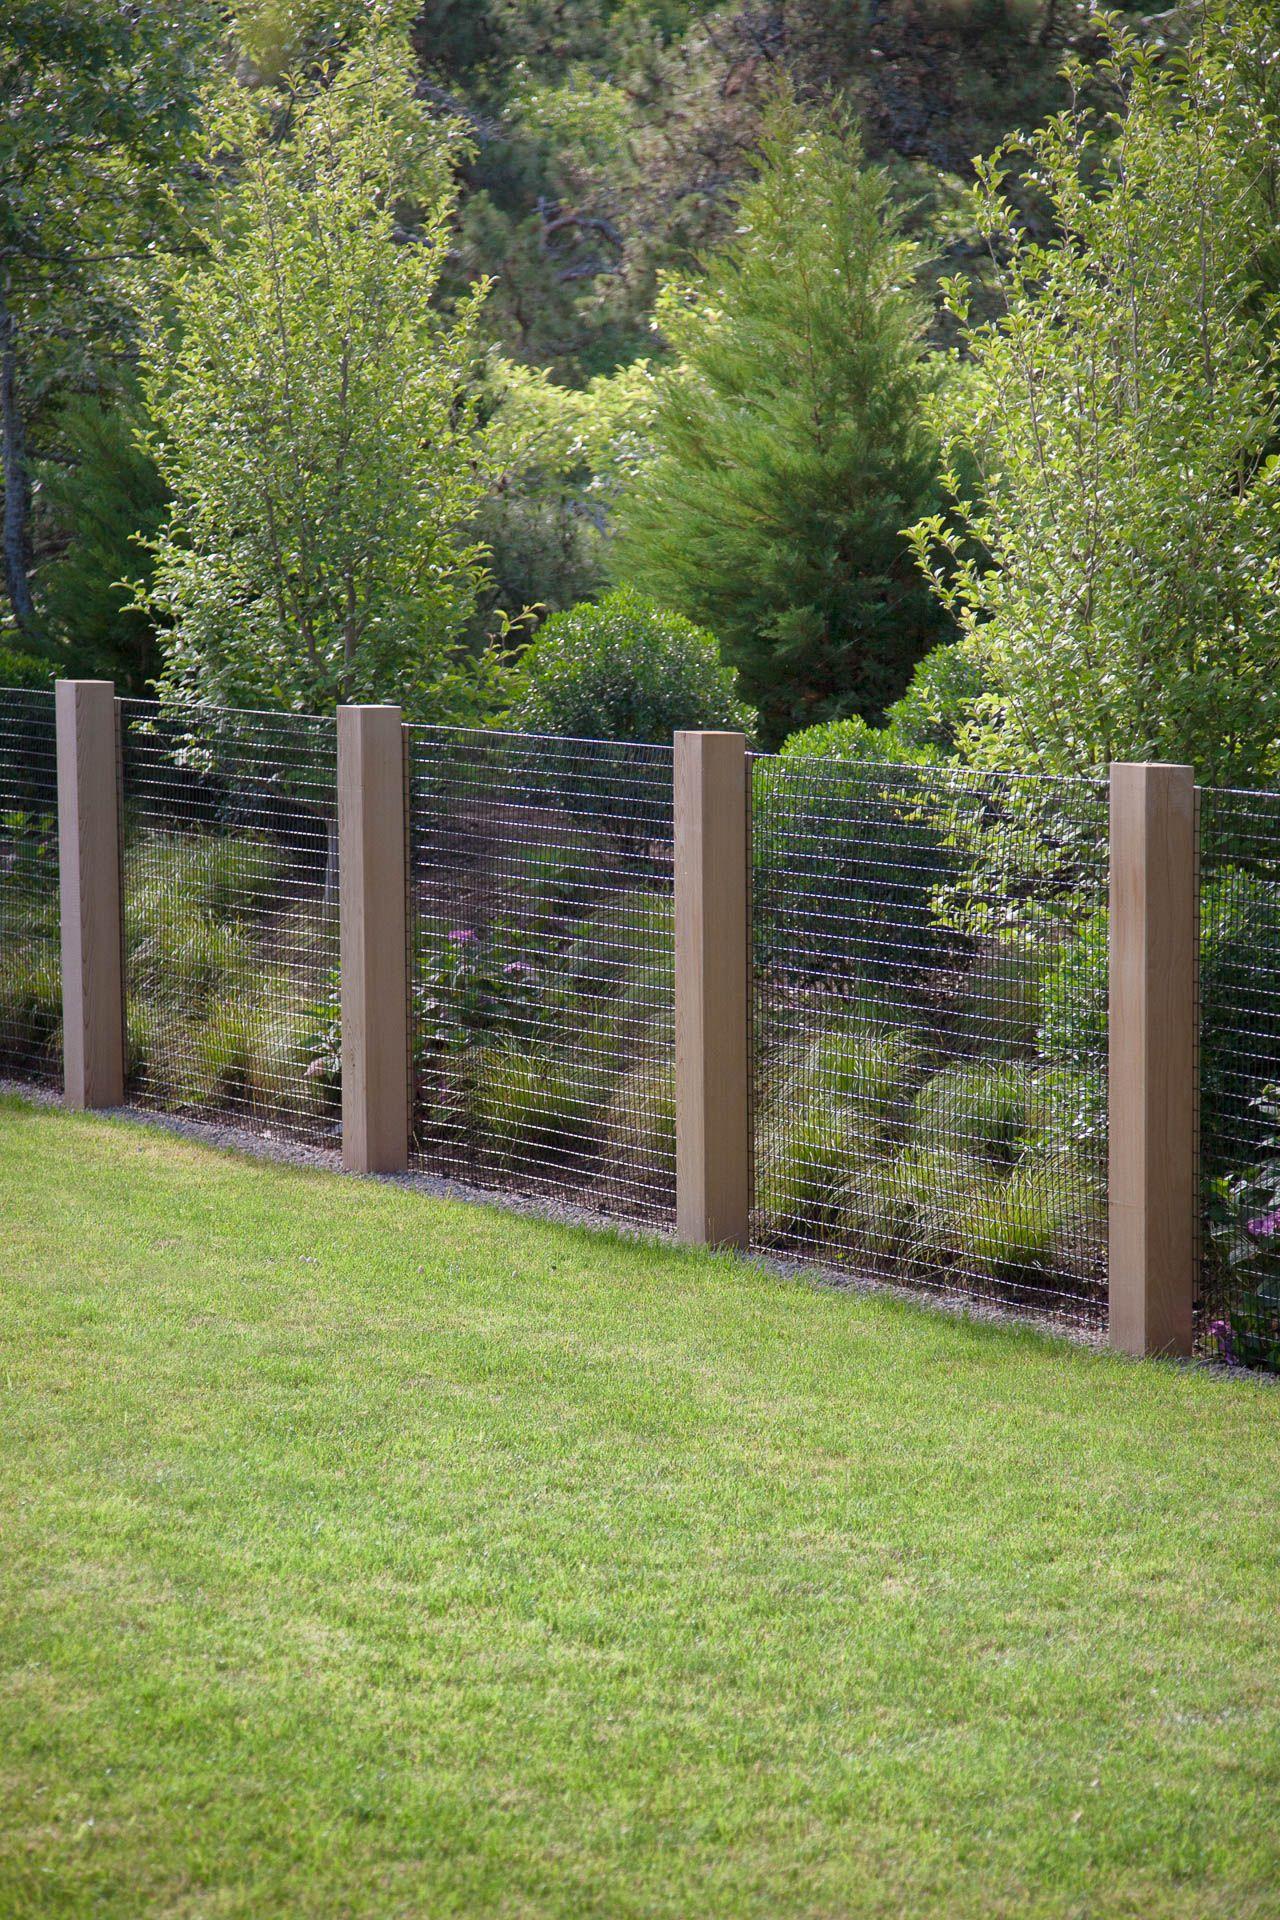 dune garden matthew cunningham landscape design llc on backyard garden fence decor ideas id=32119